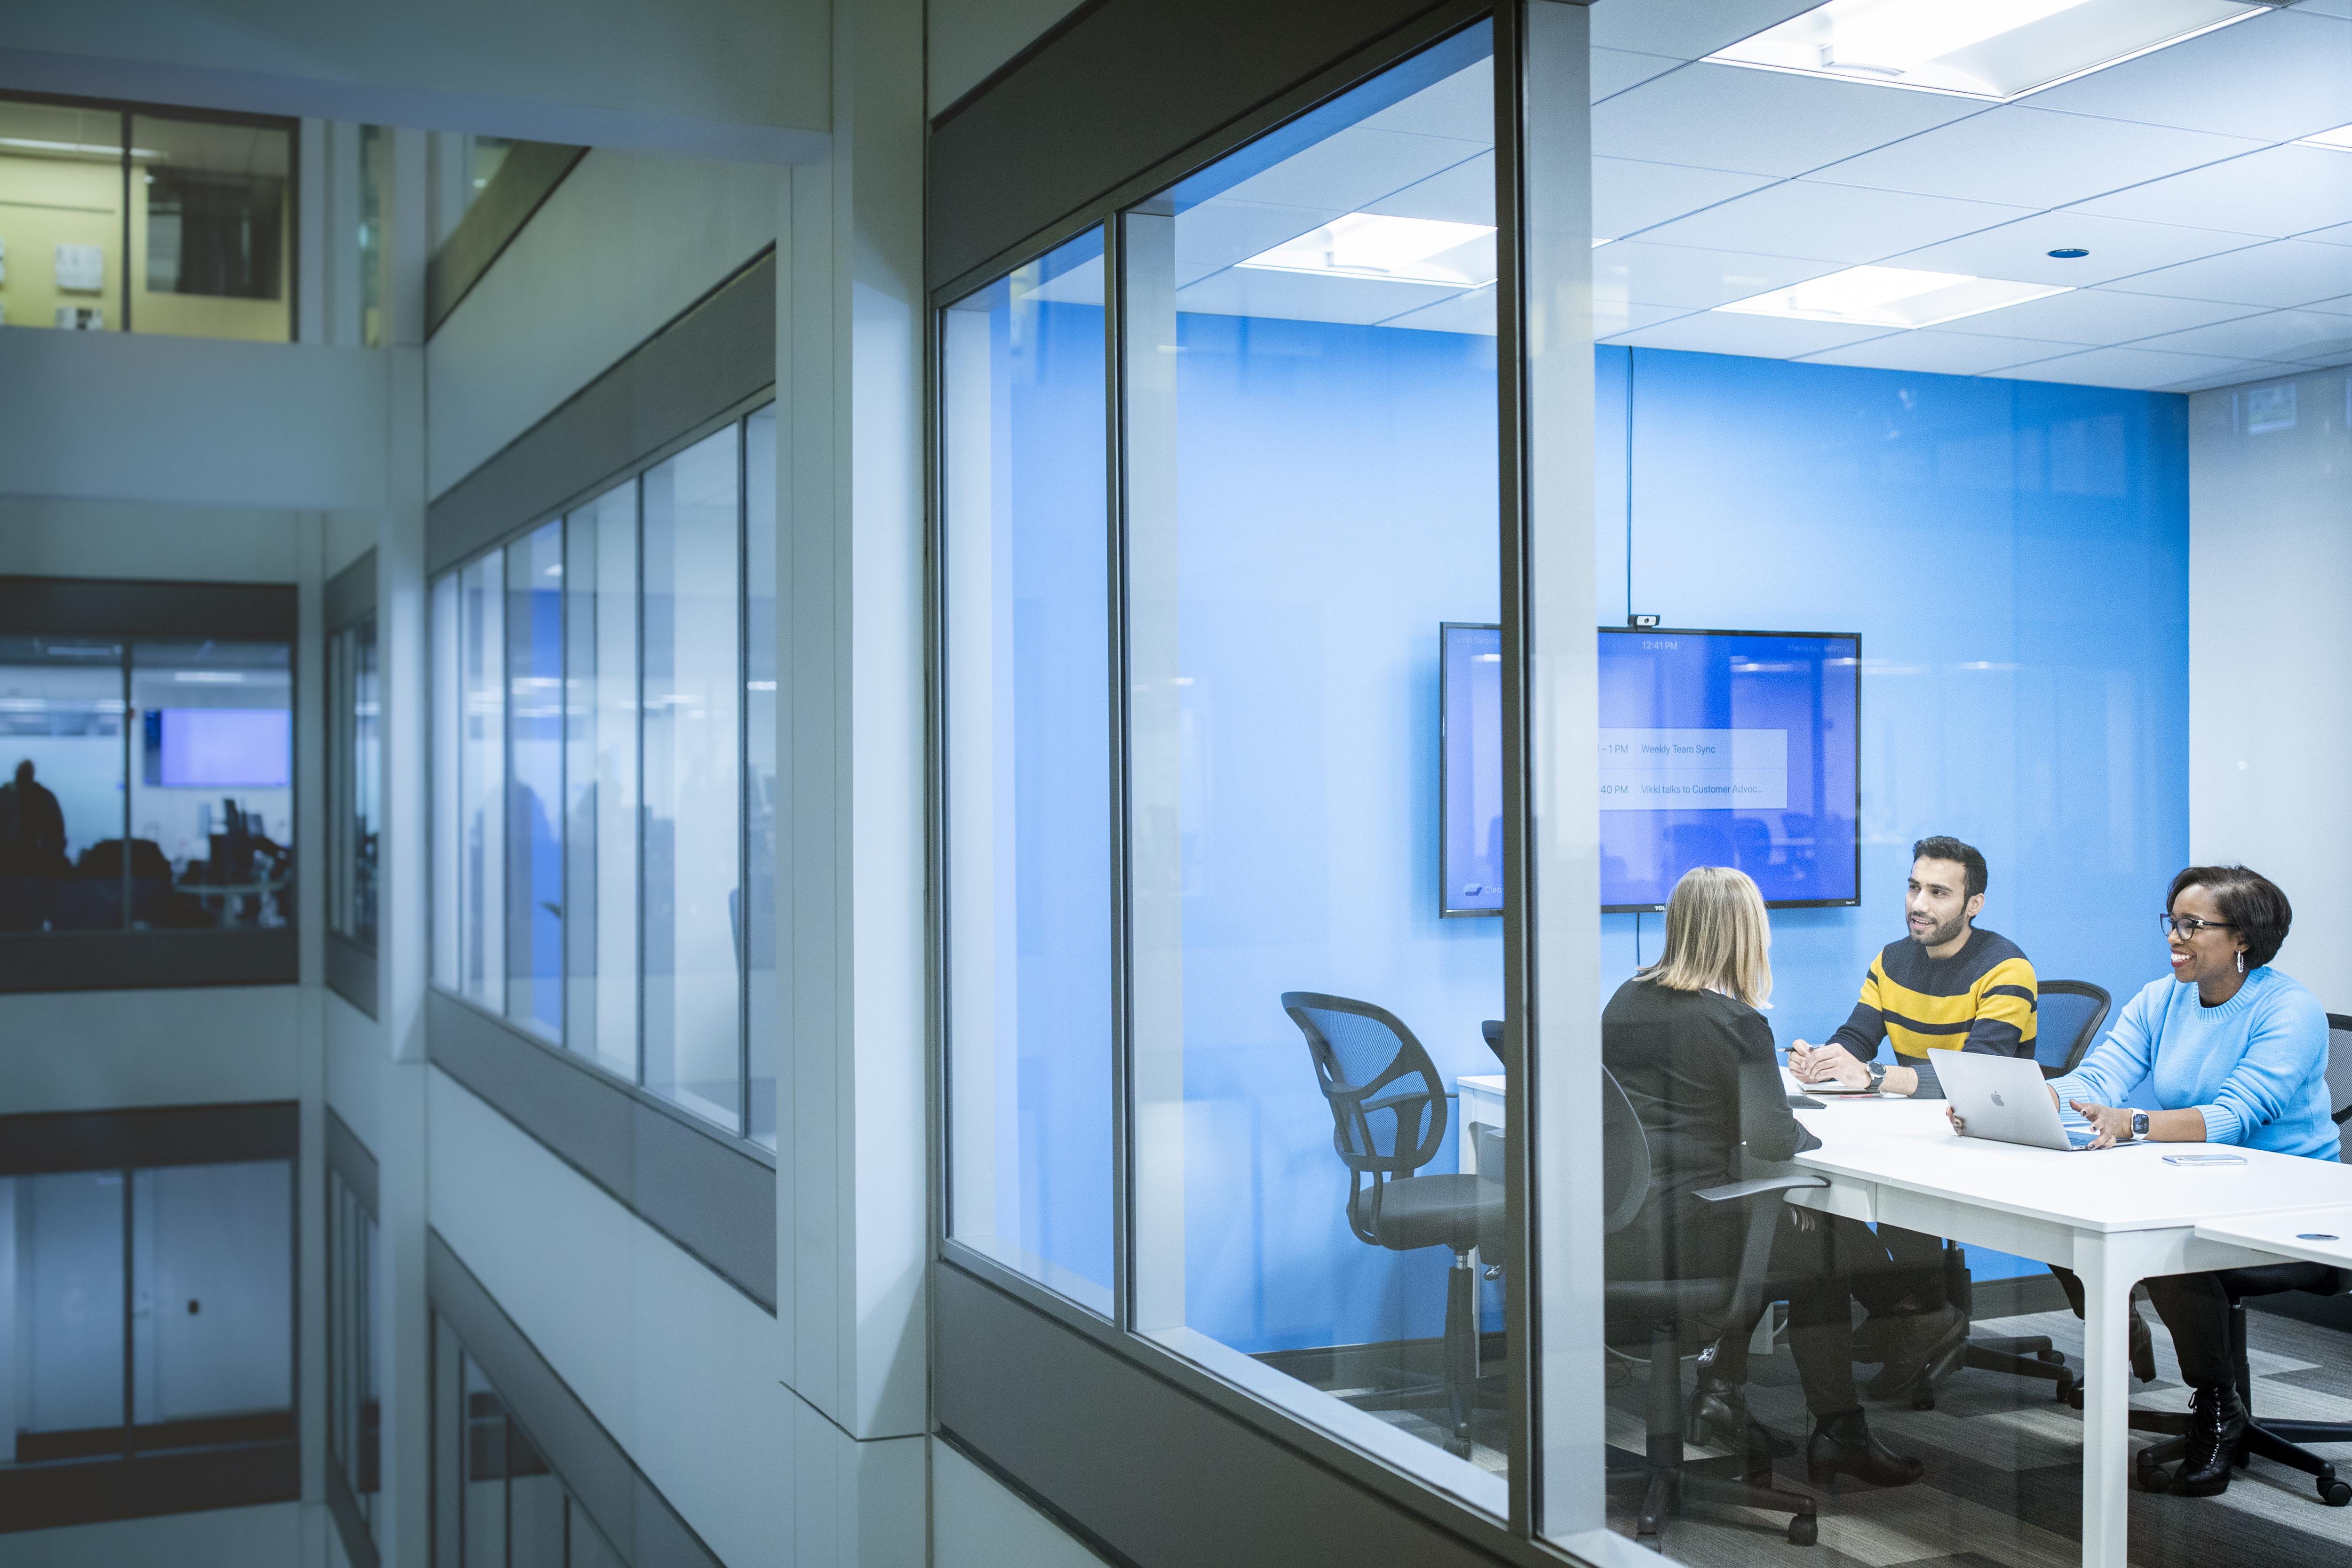 10 Insurtech Companies Driving the Midwest Insurtech Boom